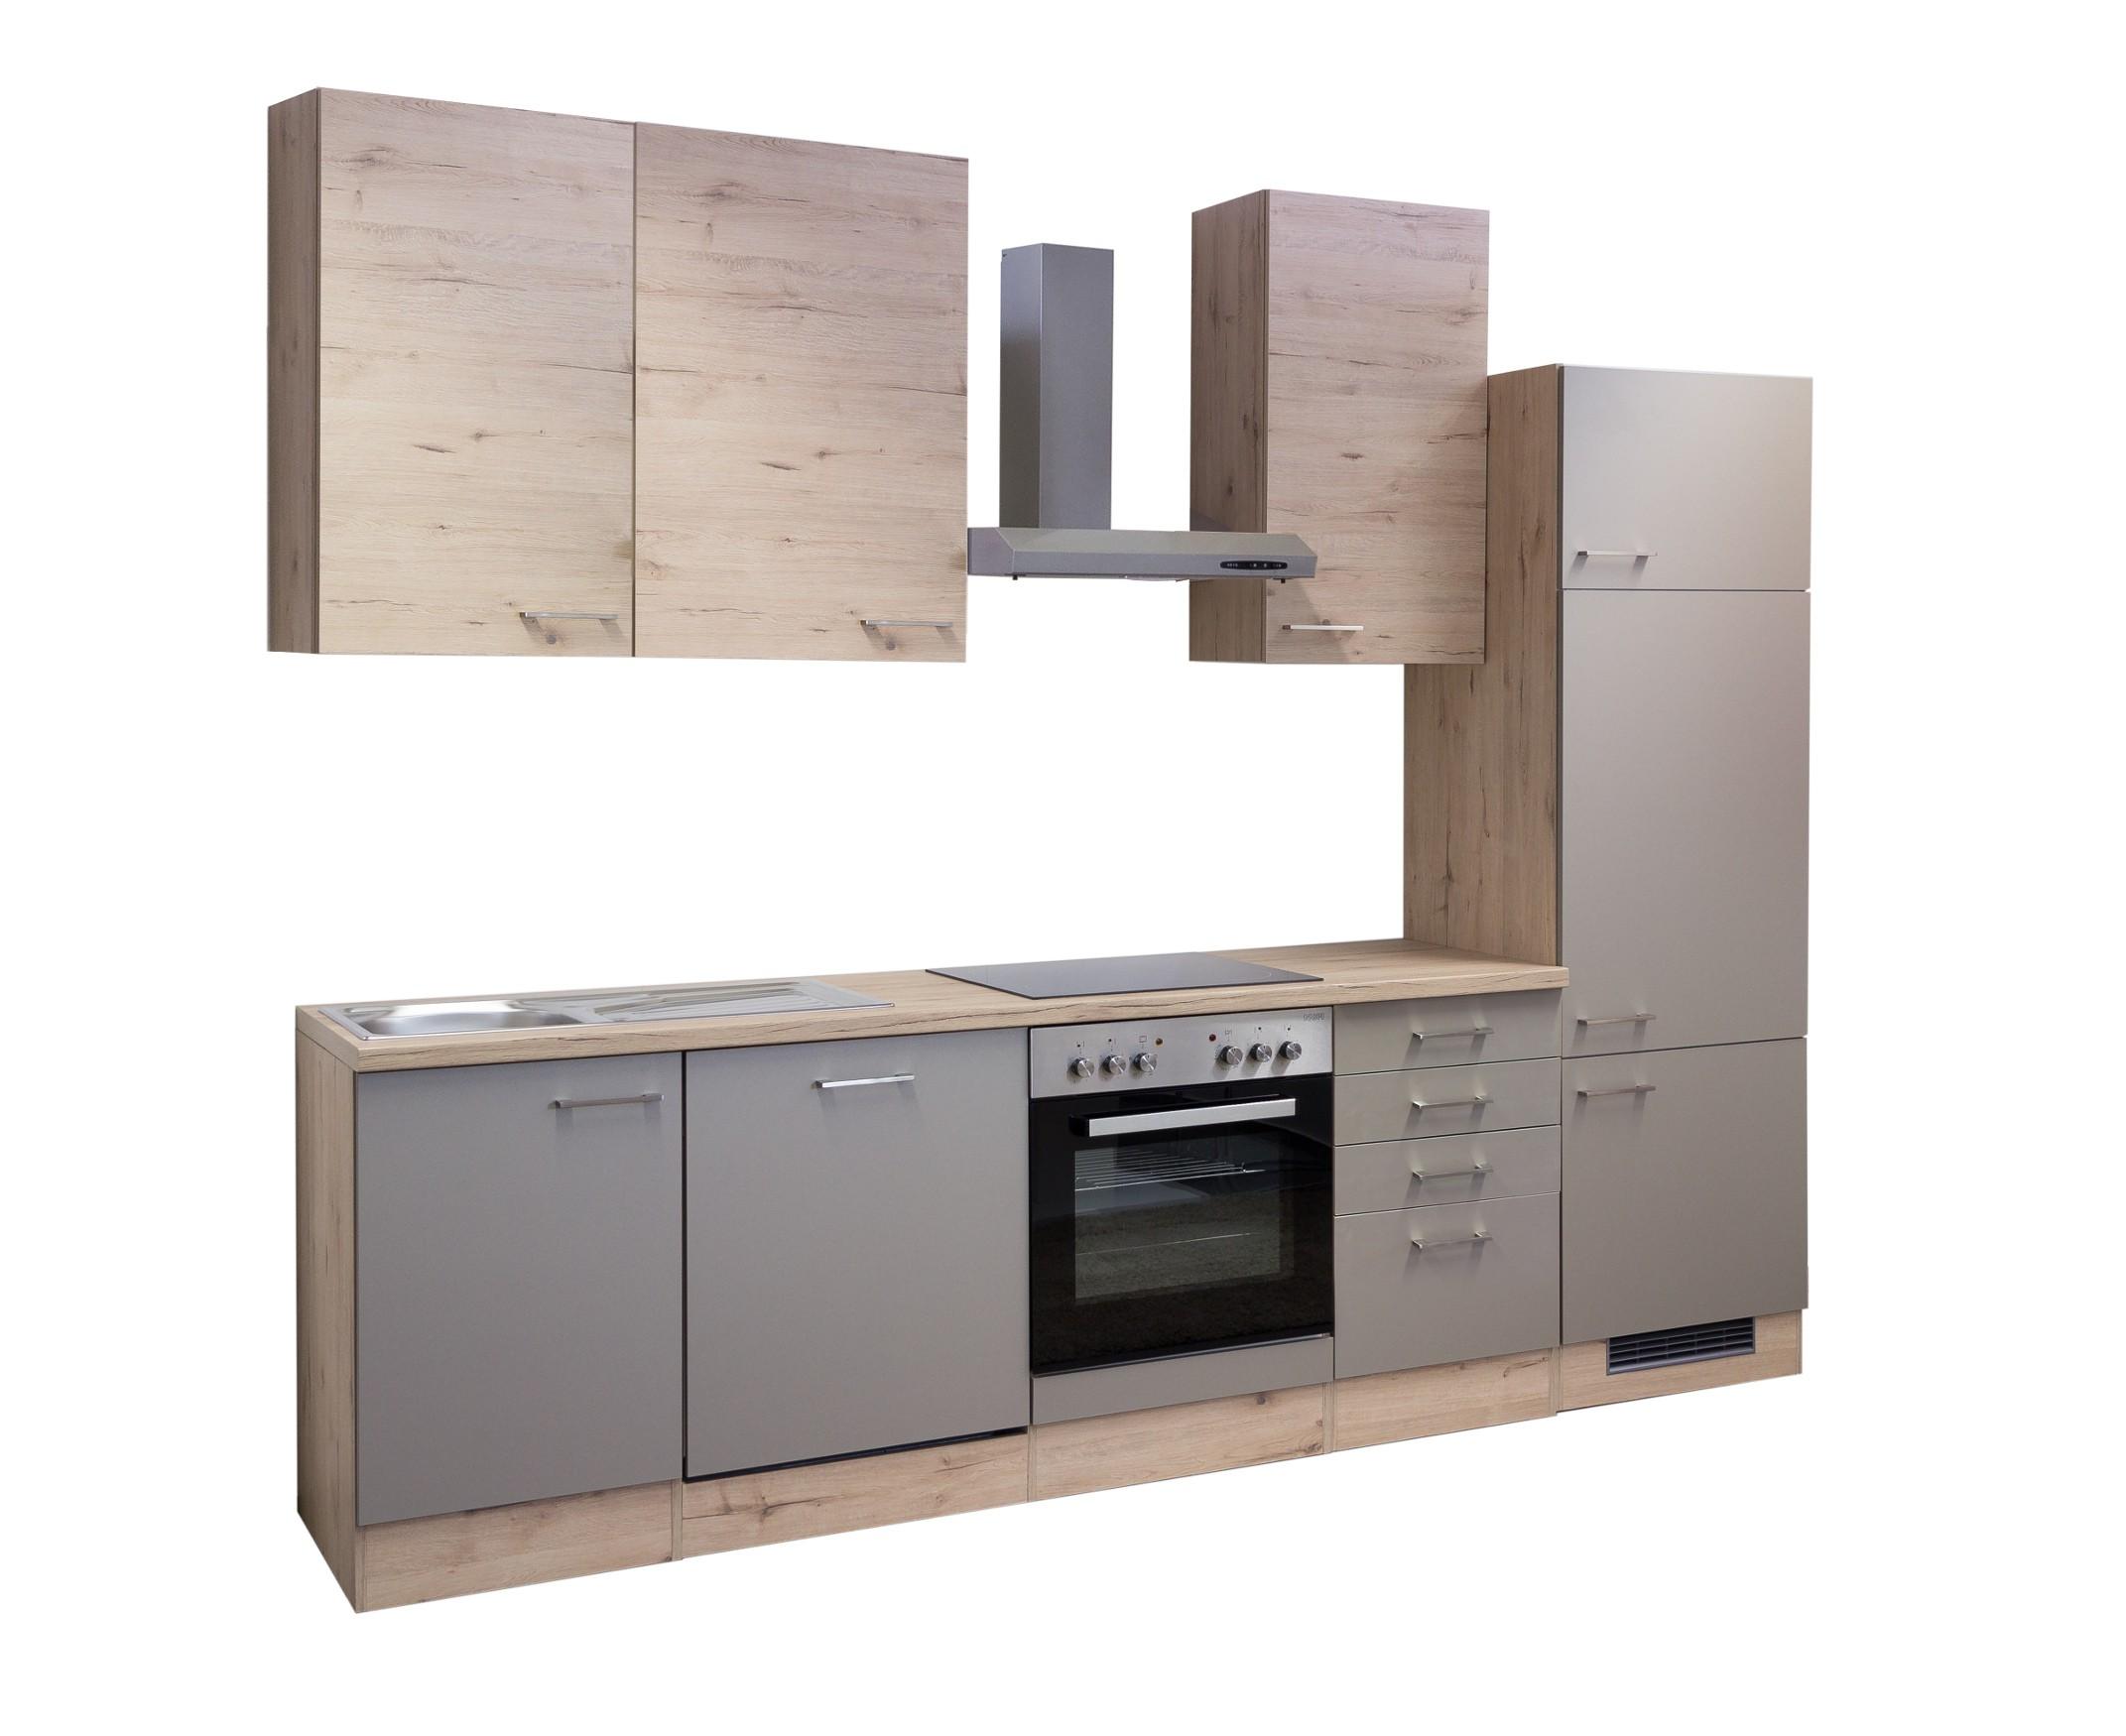 k chenzeile riva k che mit e ger ten 14 teilig breite 280 cm bronze metallic k che. Black Bedroom Furniture Sets. Home Design Ideas